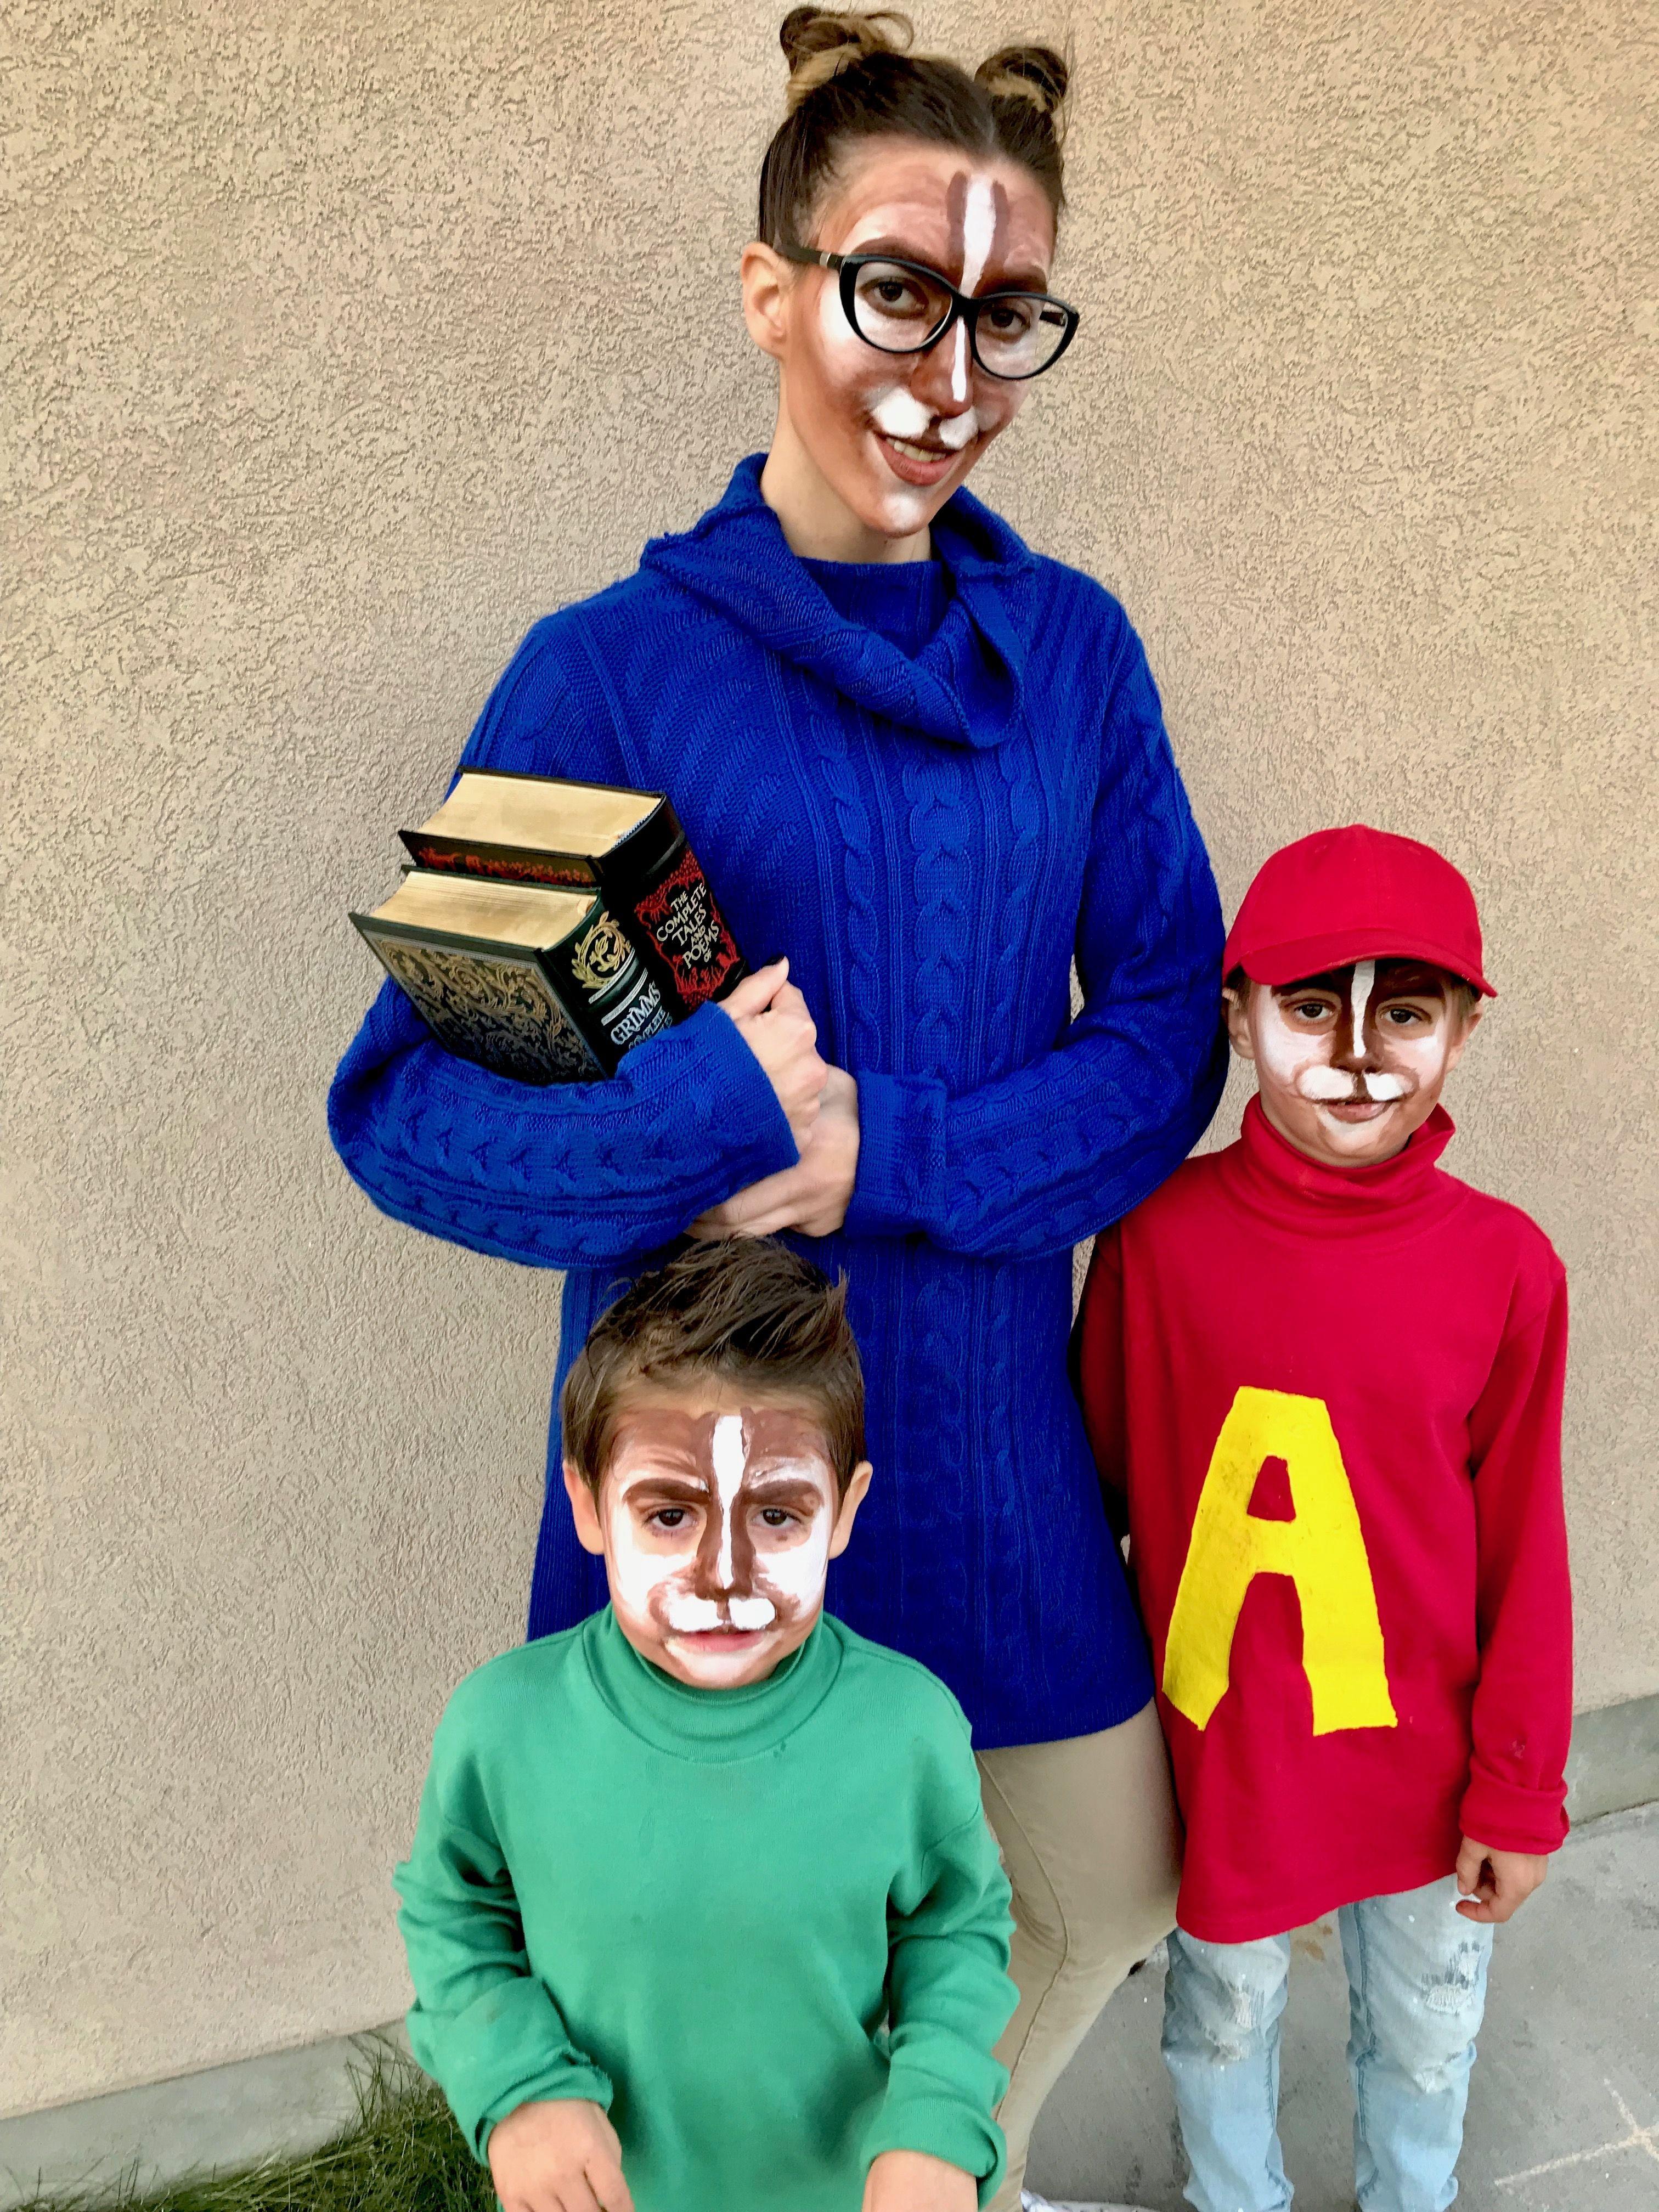 Alvin And The Chipmunks Family Halloween Costume Family Halloween Costumes Family Costumes Family Halloween